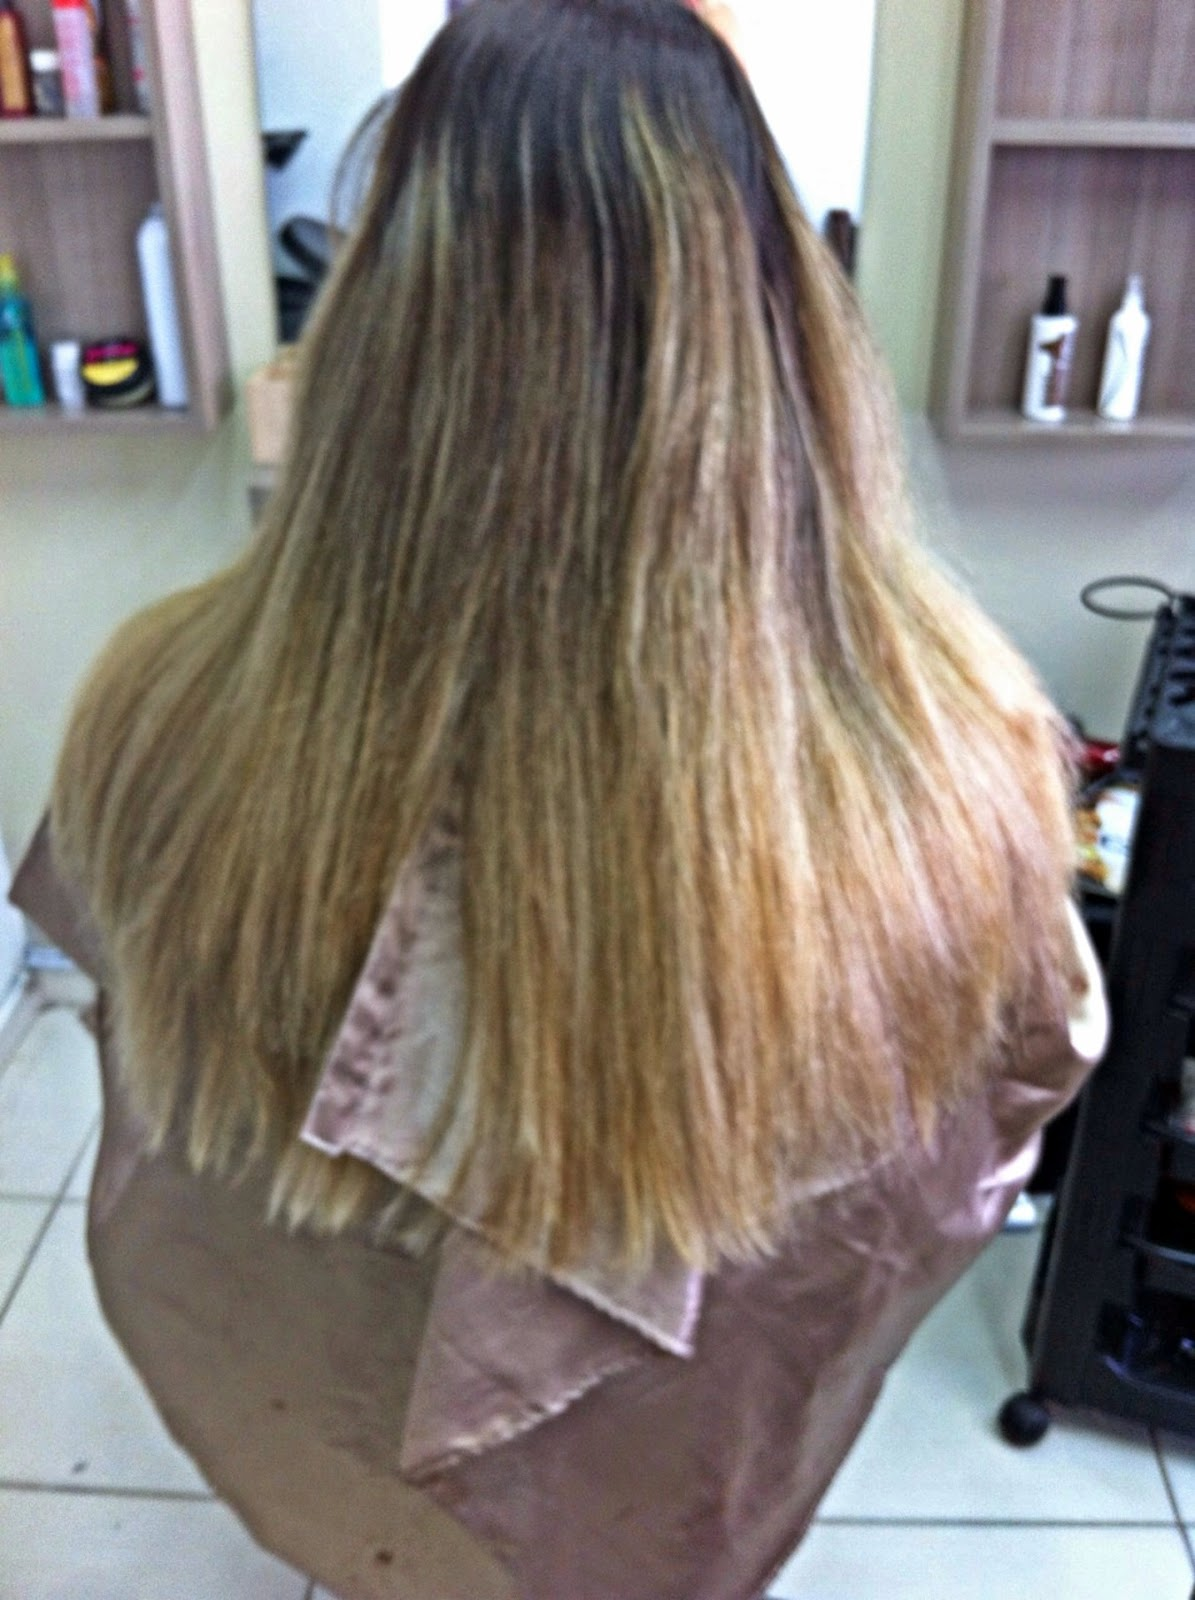 novo-corte-de-cabelo-long-bob-inspirado-na-karol-pinheiro